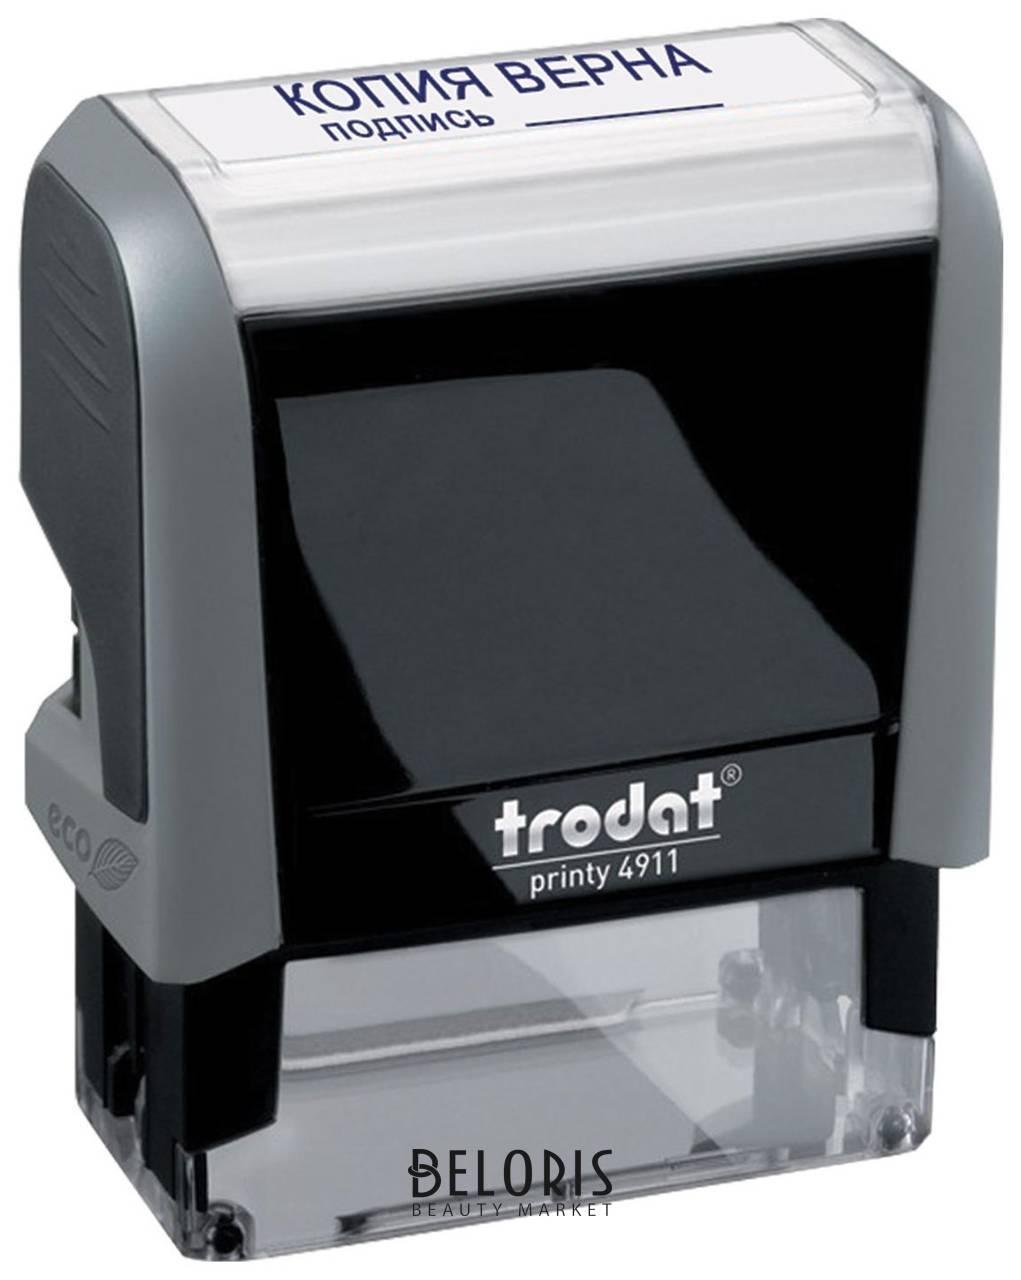 Штамп стандартный Копия верна, подпись, оттиск 38х14 мм, синий, Trodat 4911P4-3.42 Trodat